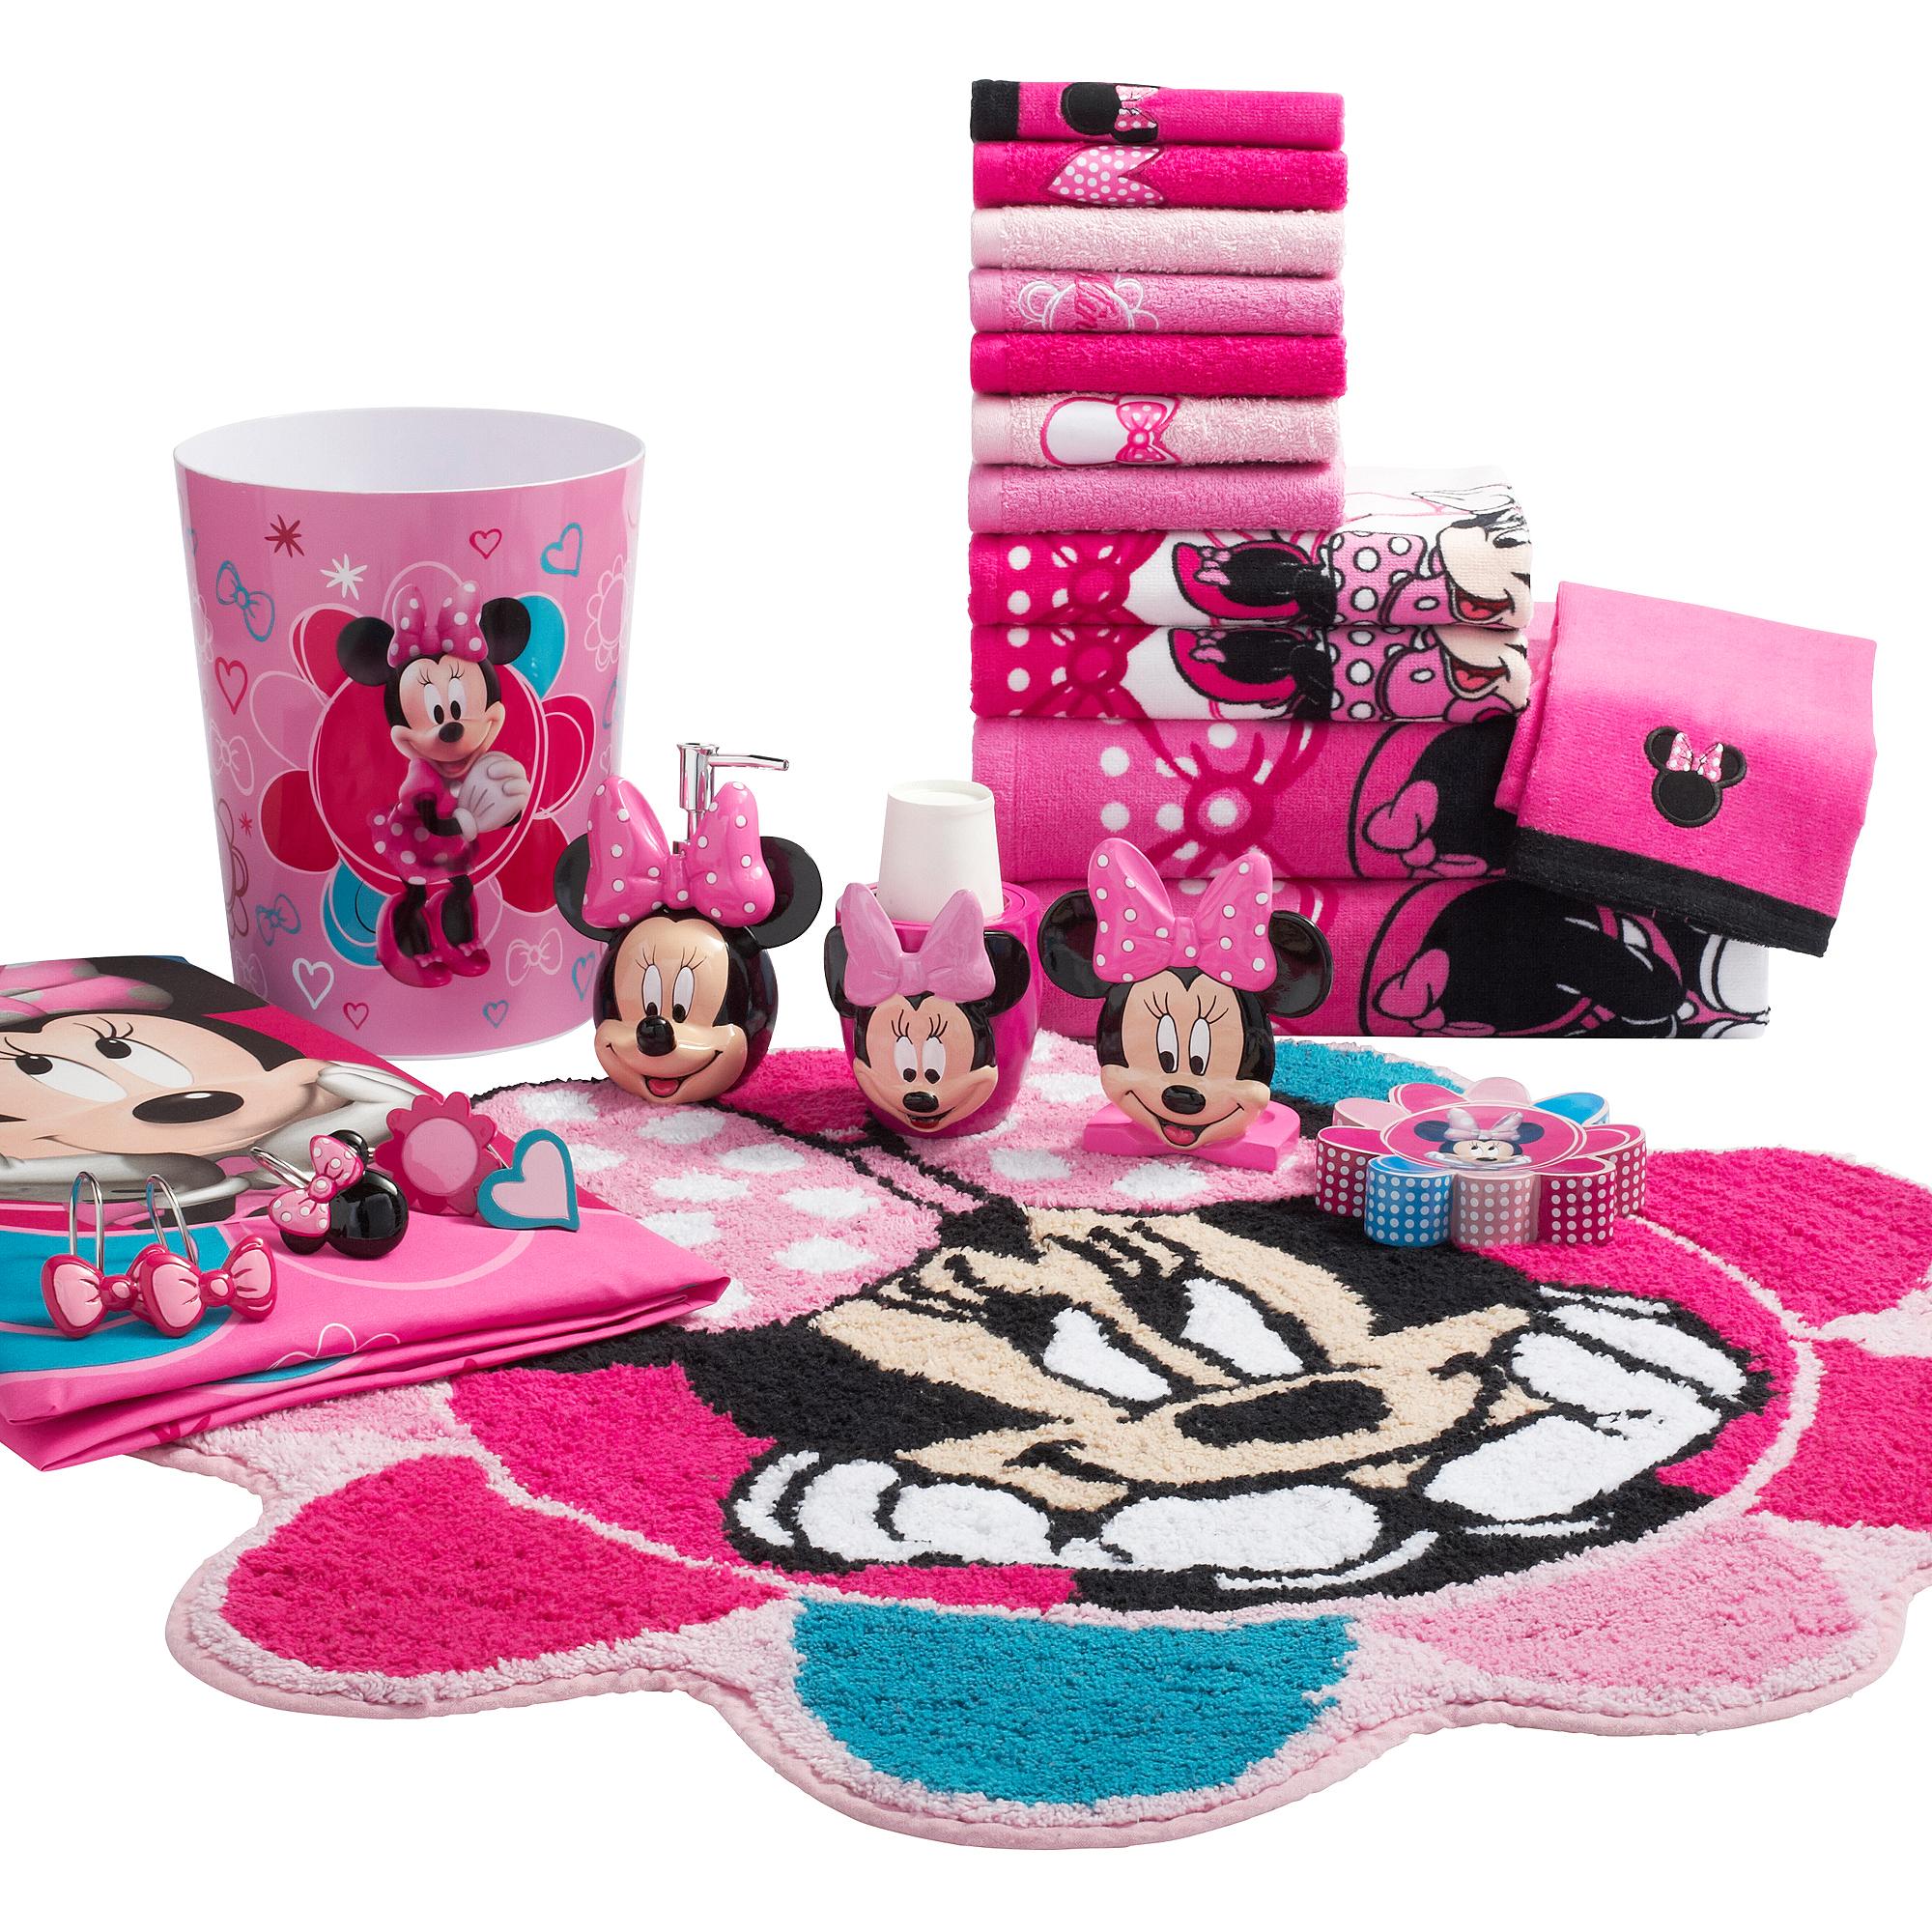 Minnie Mouse Decorative Bath Collection - Bath Rug